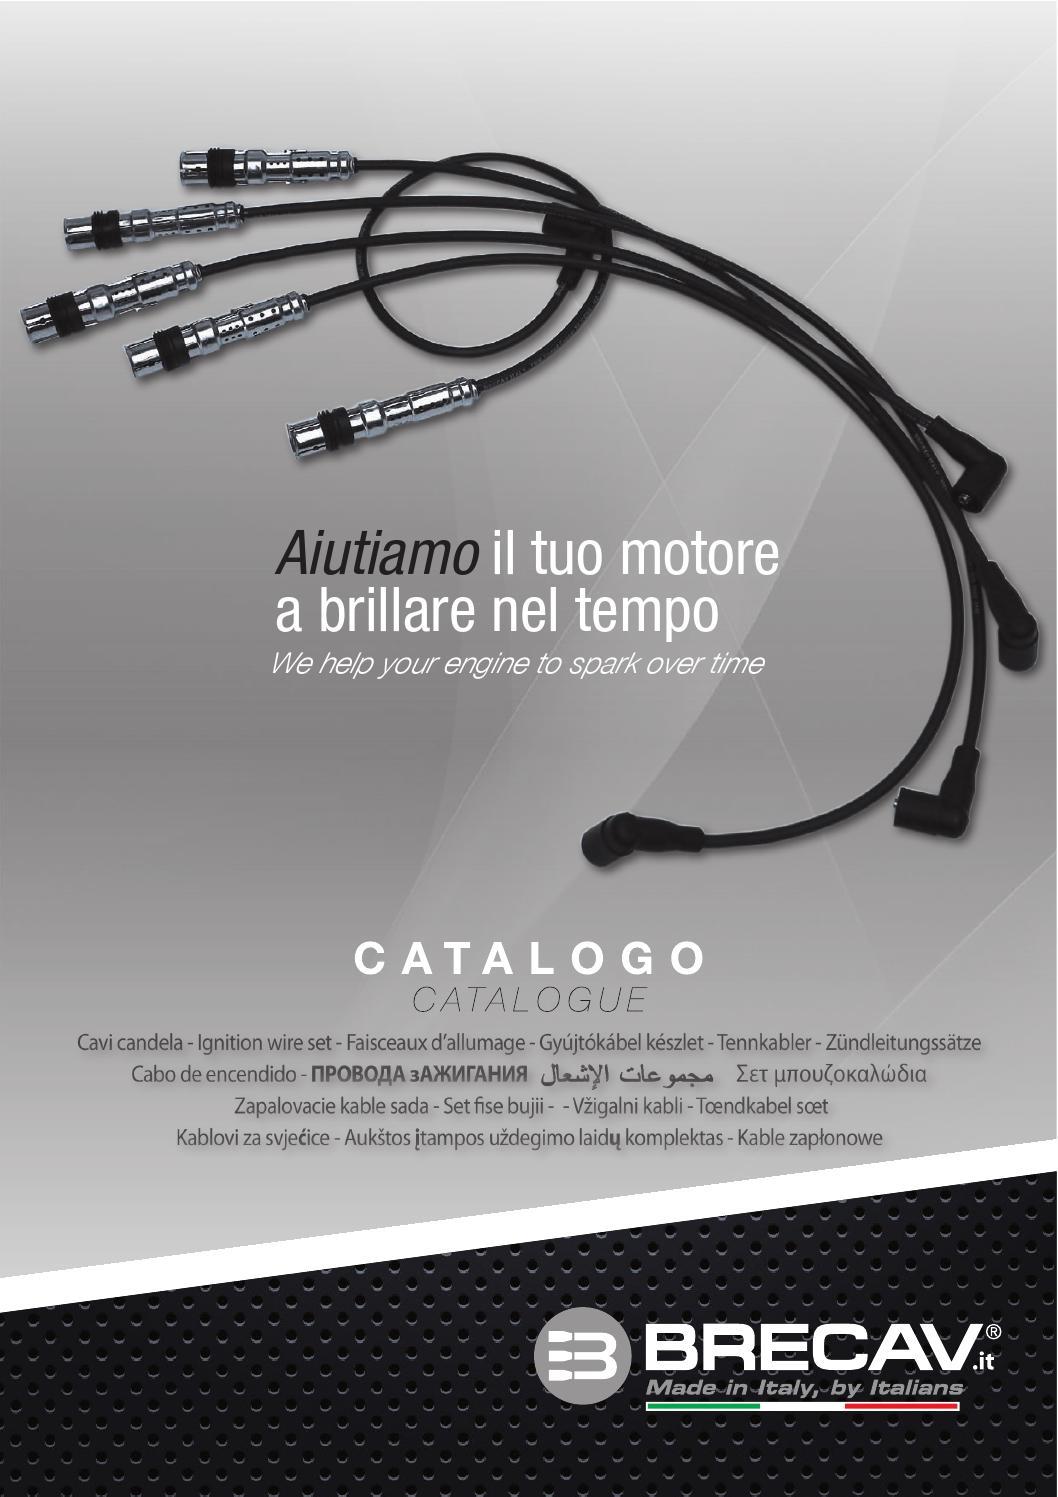 Candela X Escort catalogo brecav cavi candela 2015antonio brecav - issuu